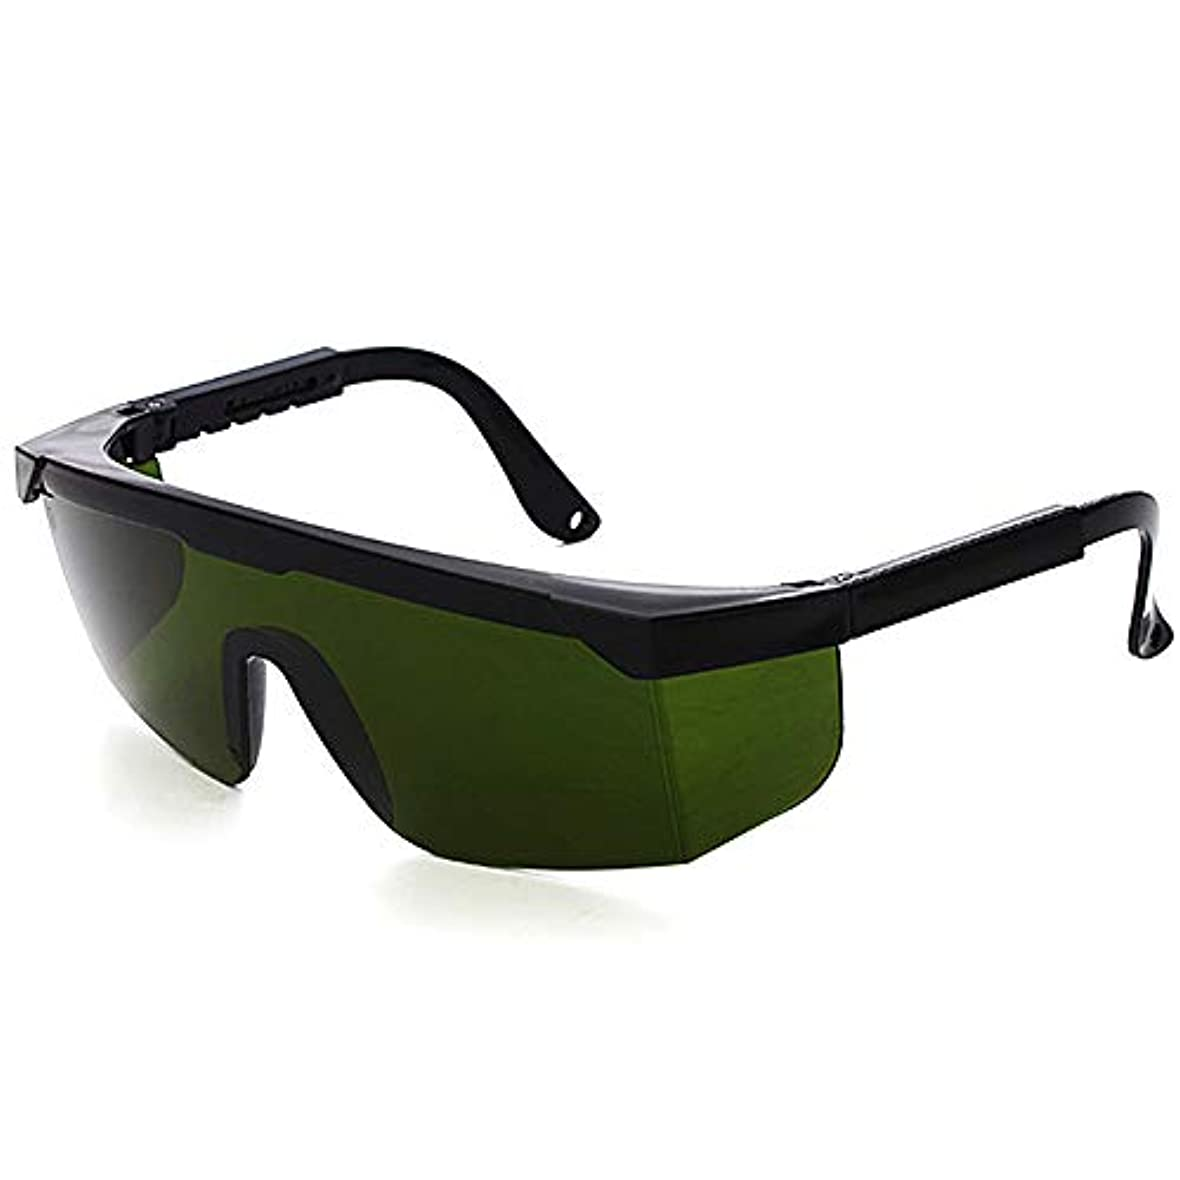 Jiayaofu レーザー保護メガネIPL美容機器メガネレーザーペアIPLメガネ、安全メガネ